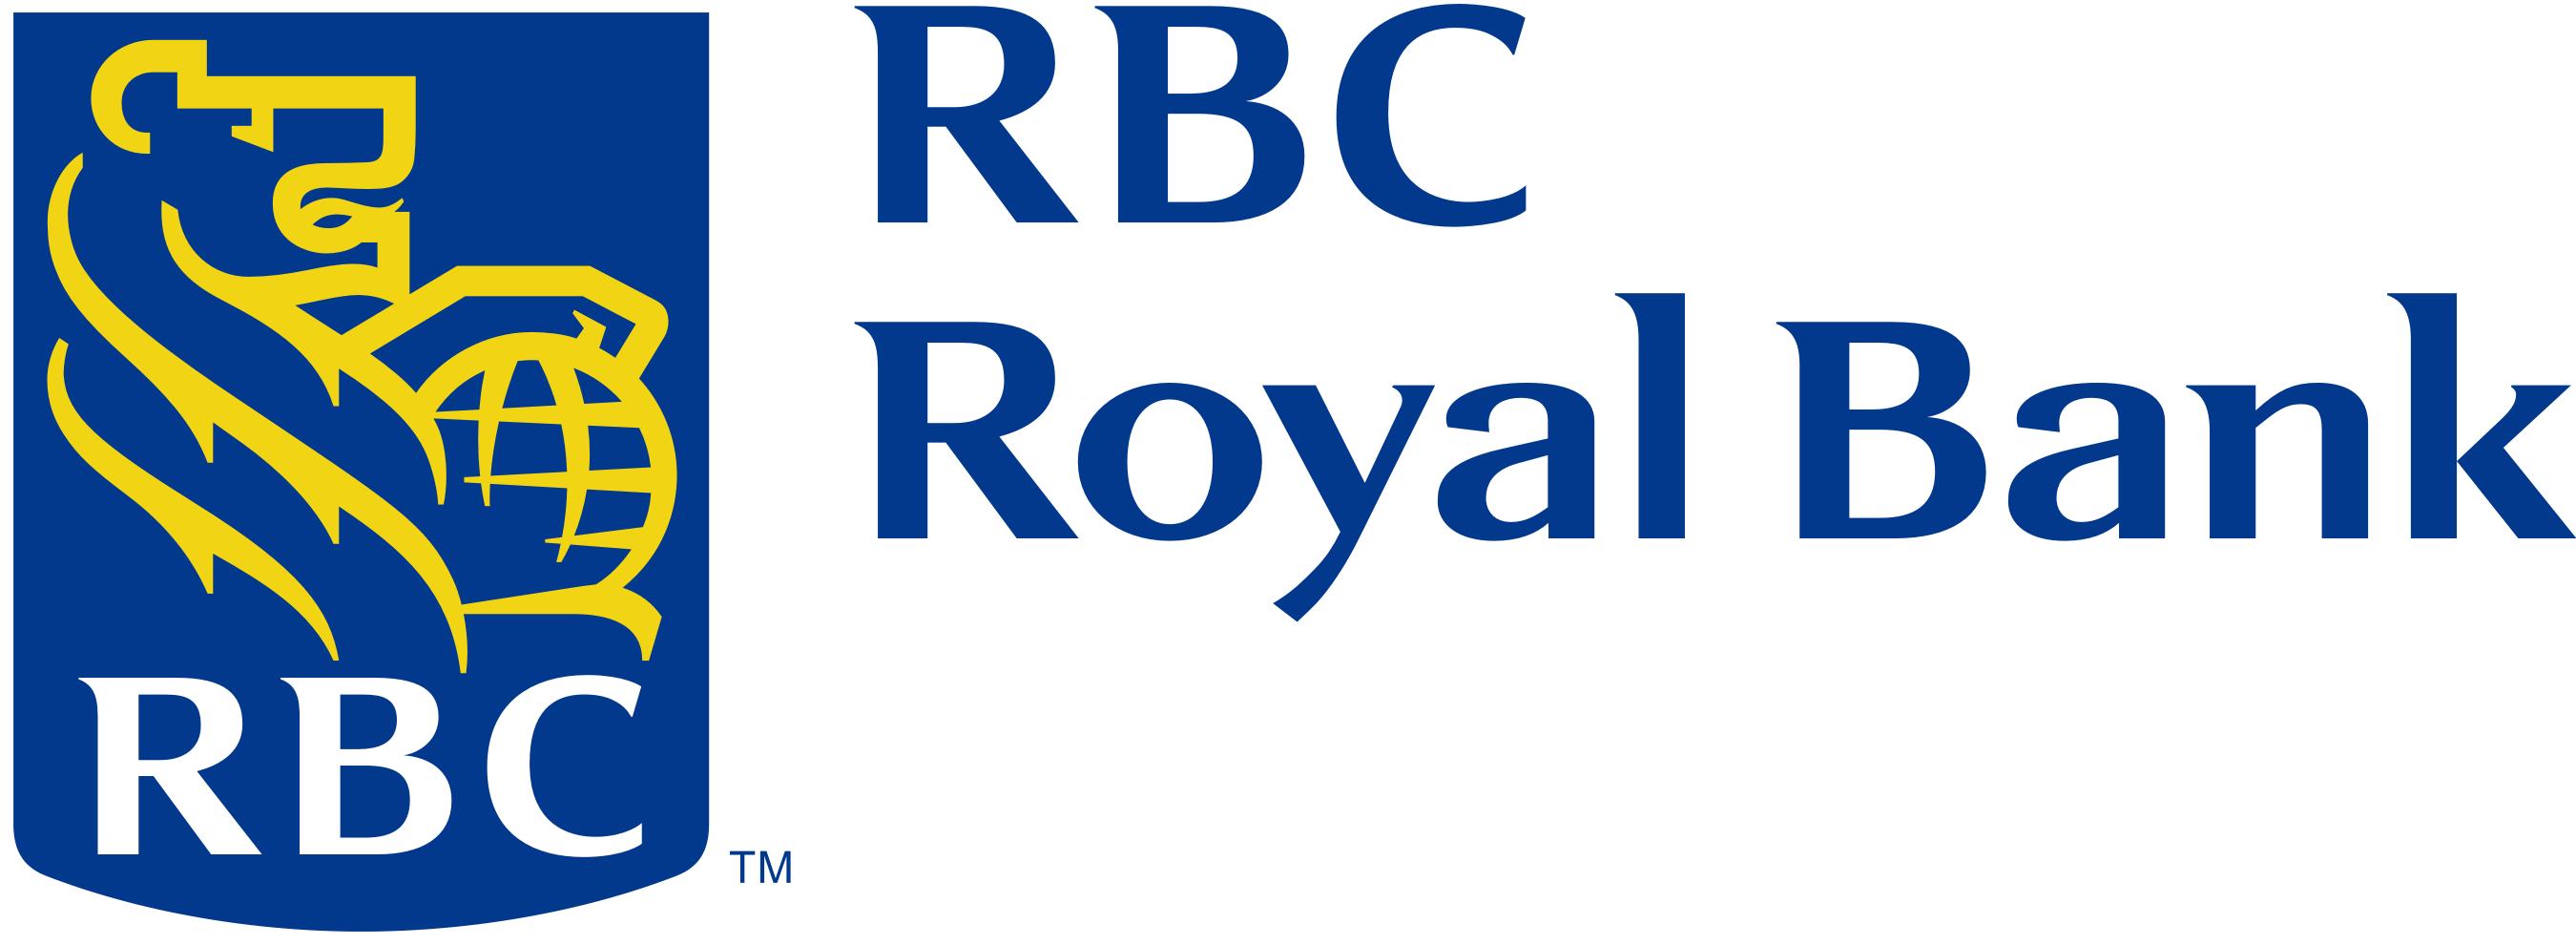 Corporate customer logo